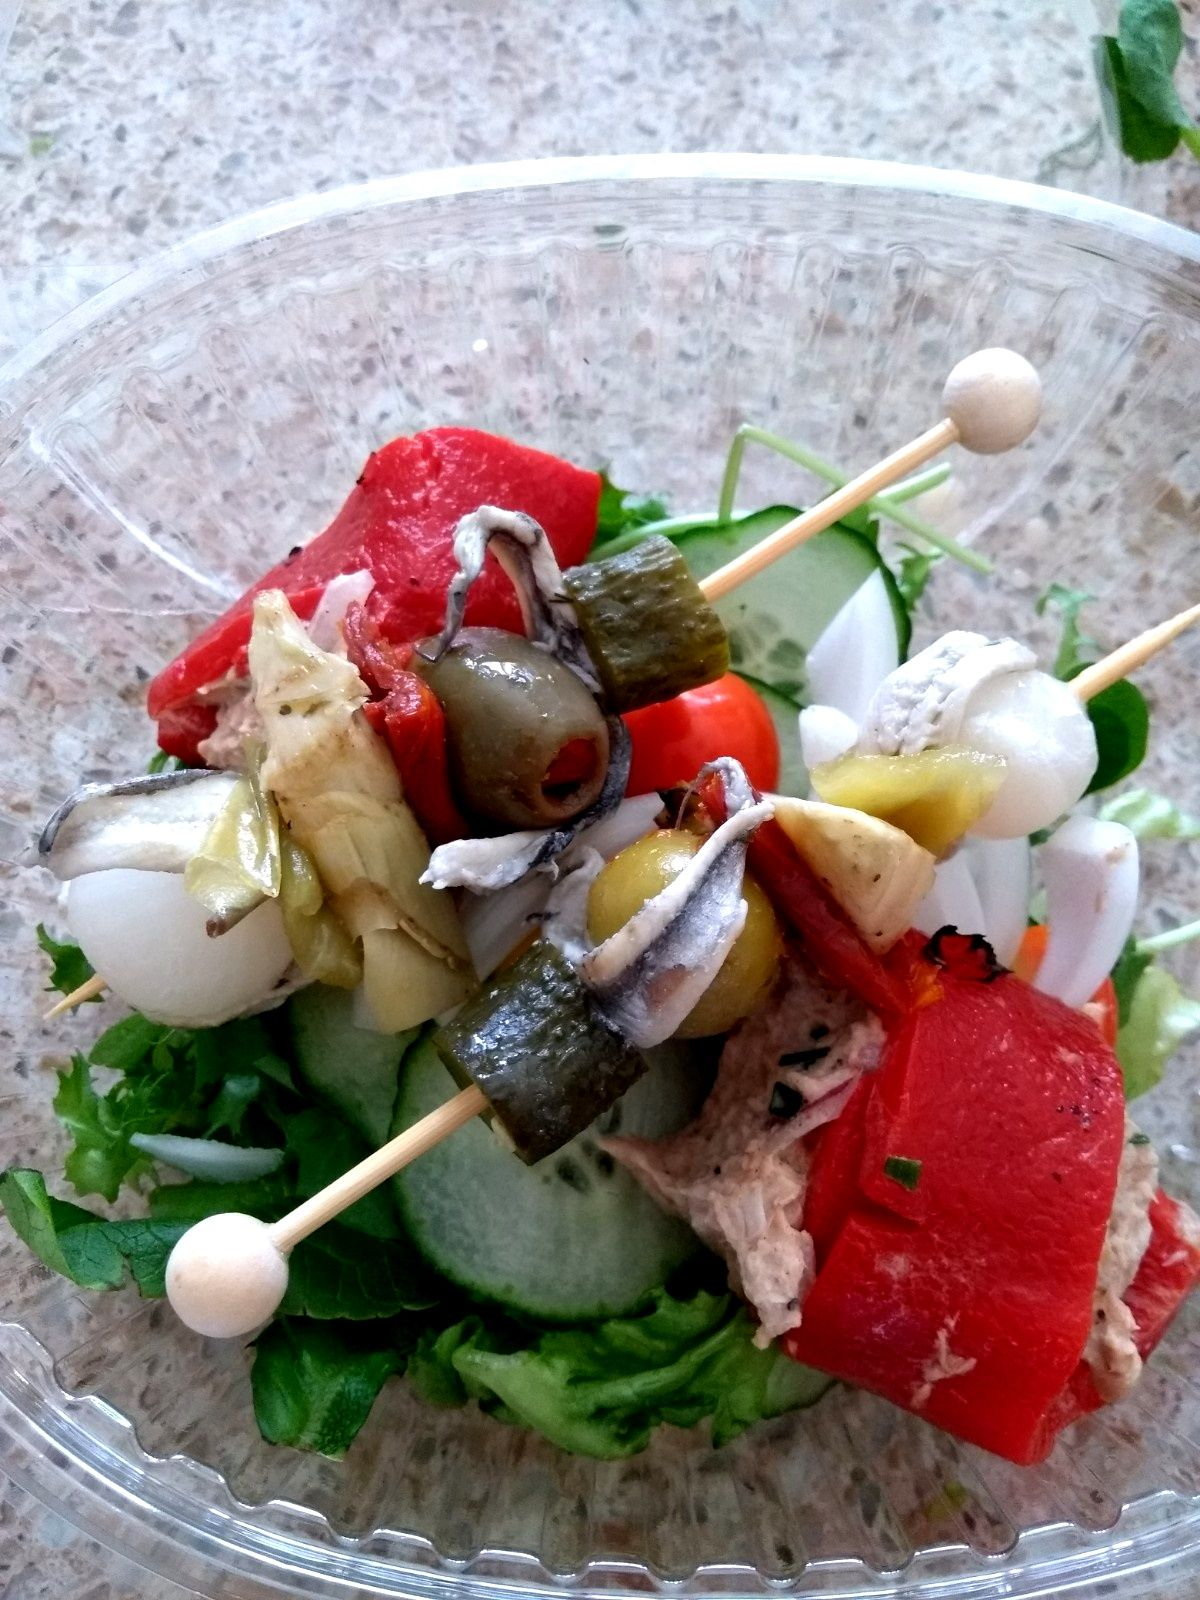 tapas - salad